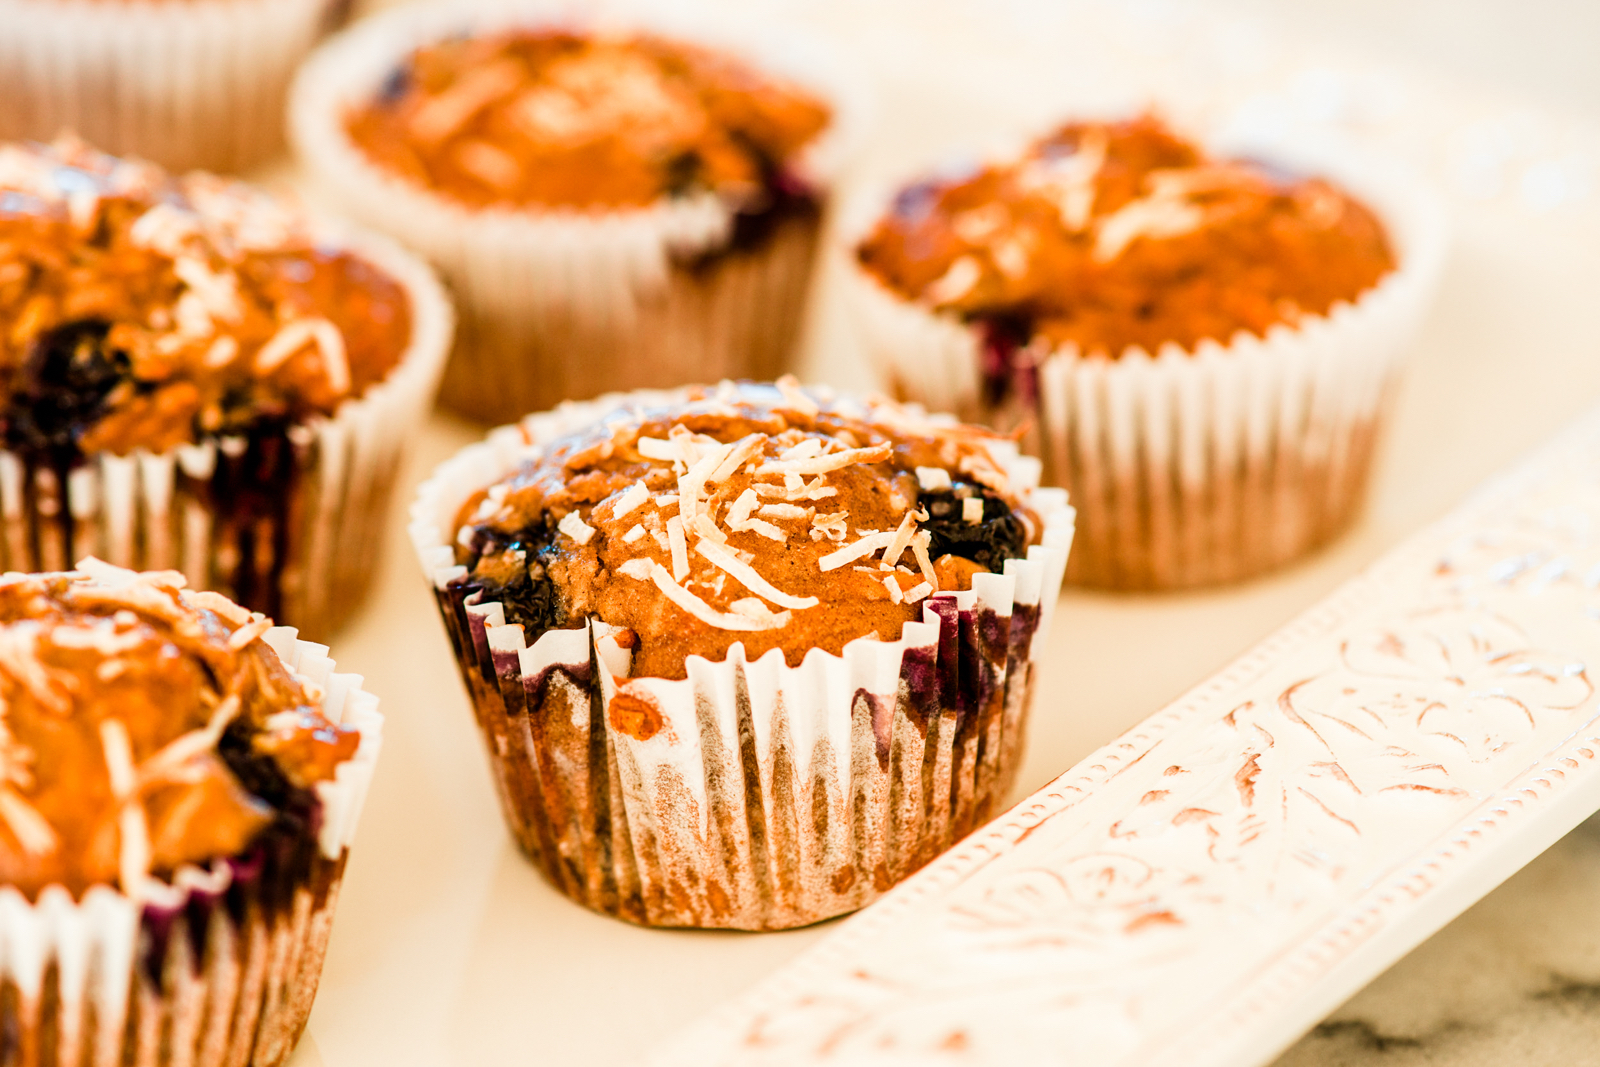 Blueberry and Carob Muffins Recipe | Carob Recipes using Australian Carobs